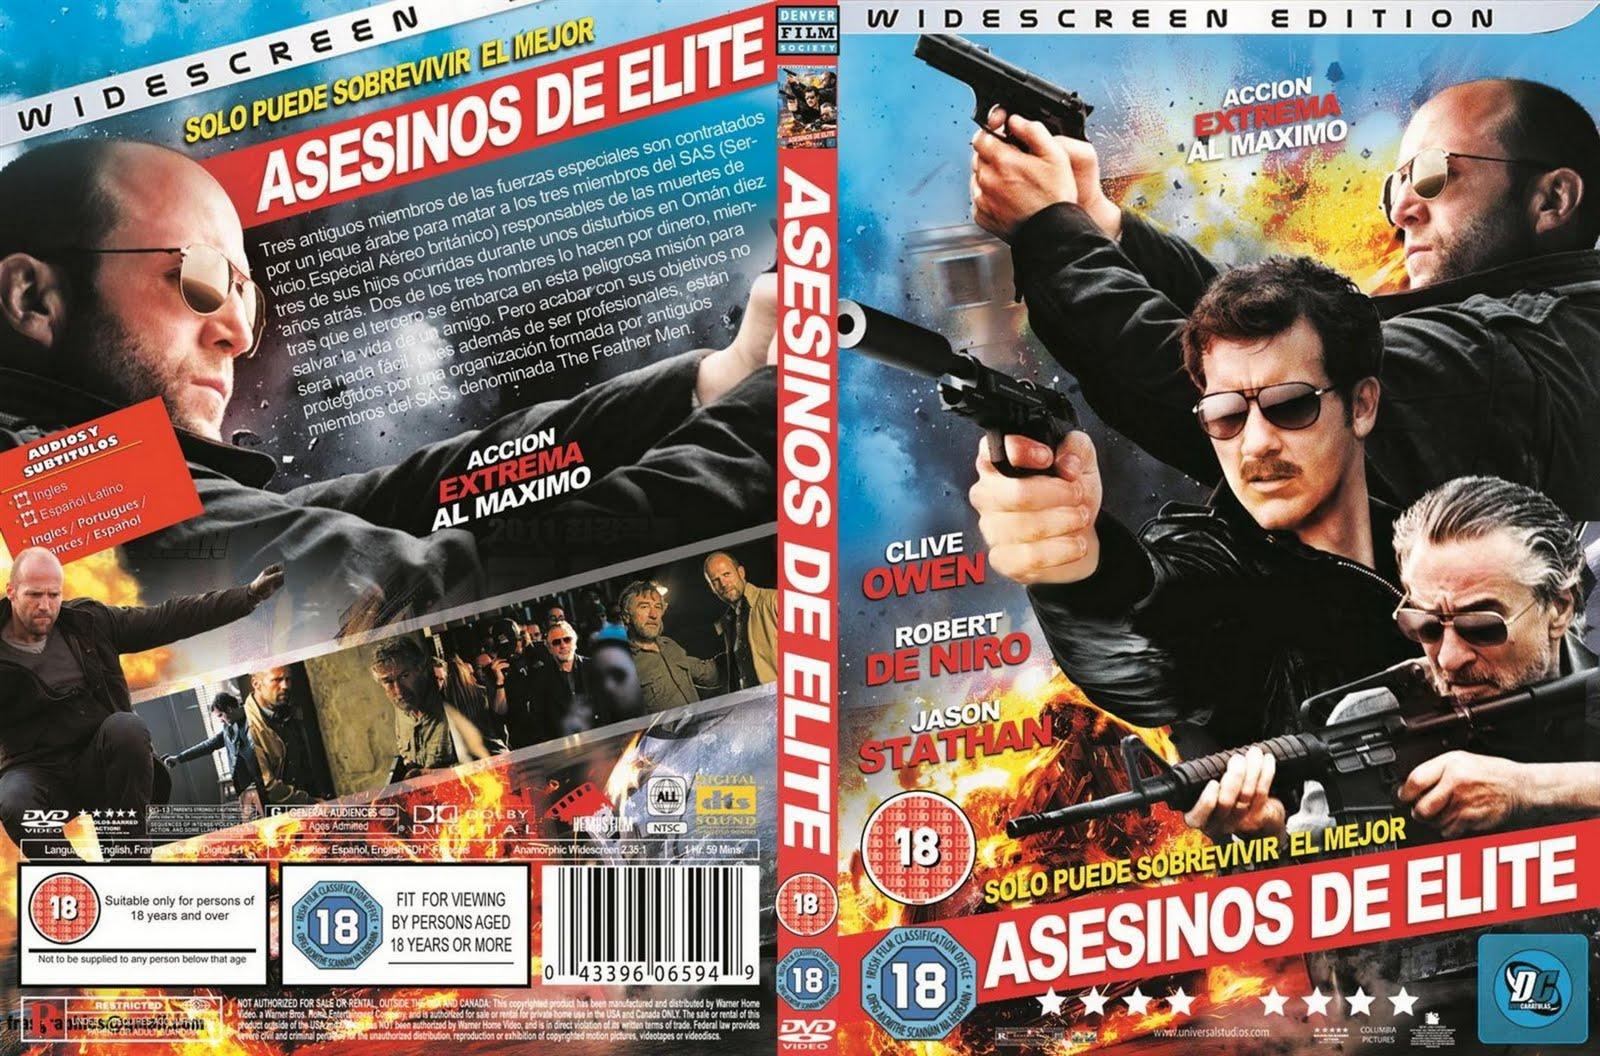 http://1.bp.blogspot.com/-PfnI31R6NnI/Ts3AoXFQNKI/AAAAAAAAAq8/mFS_lYyyqws/s1600/Asesinos_De_Elite_-_Custom_-_V8_por_jorgedenis_%255Bdvd%255D_80.jpg